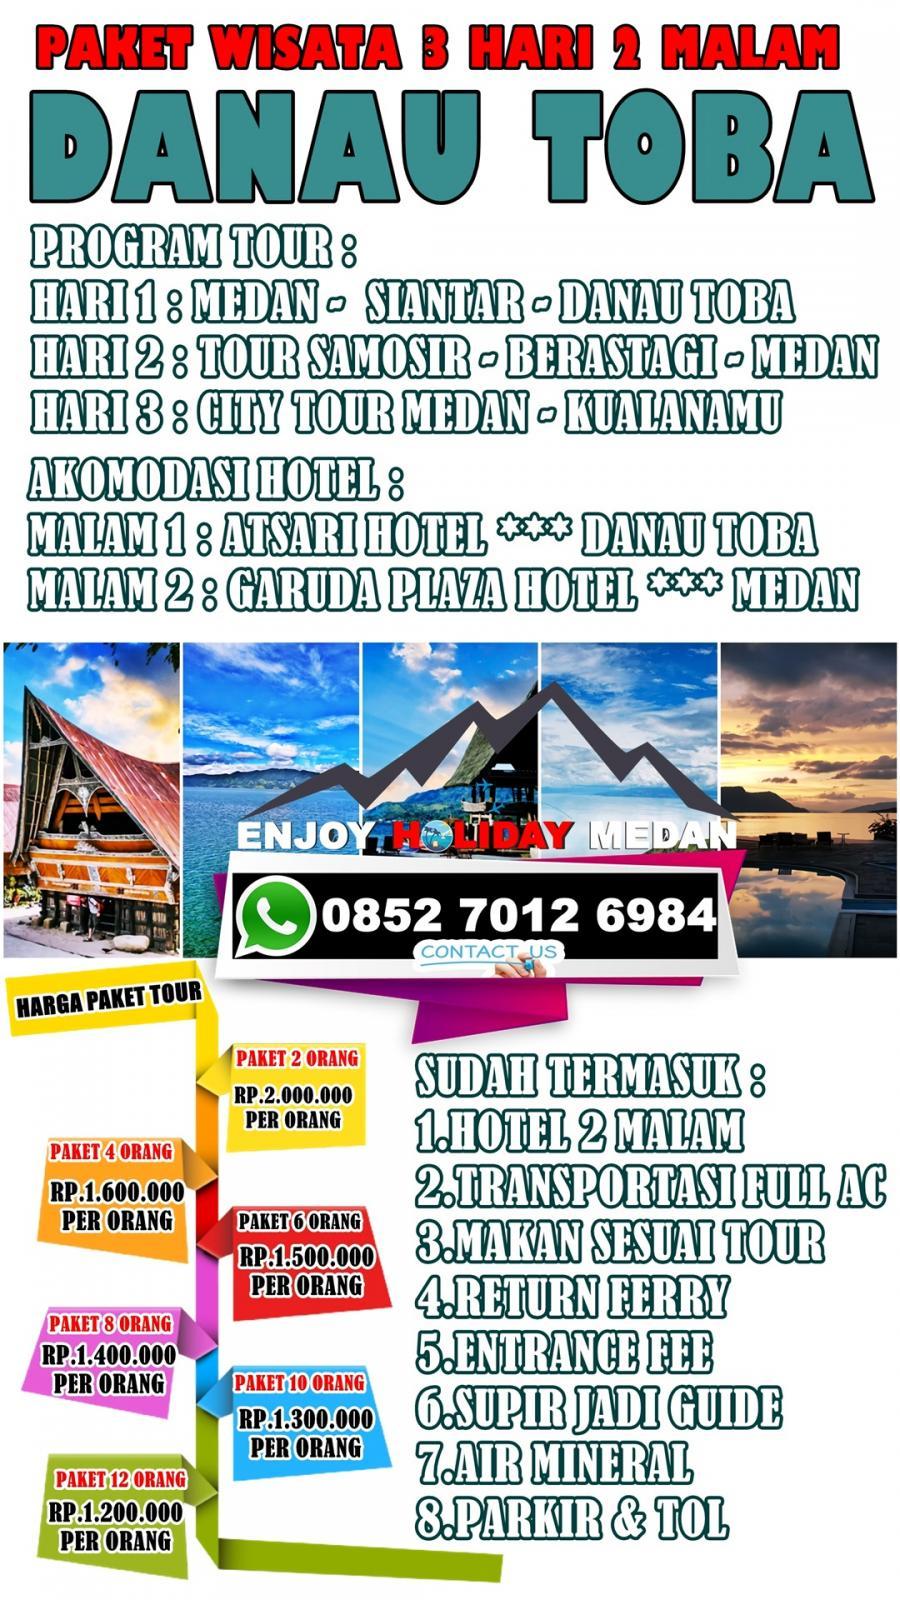 3H2M Tour Murah Danau Toba